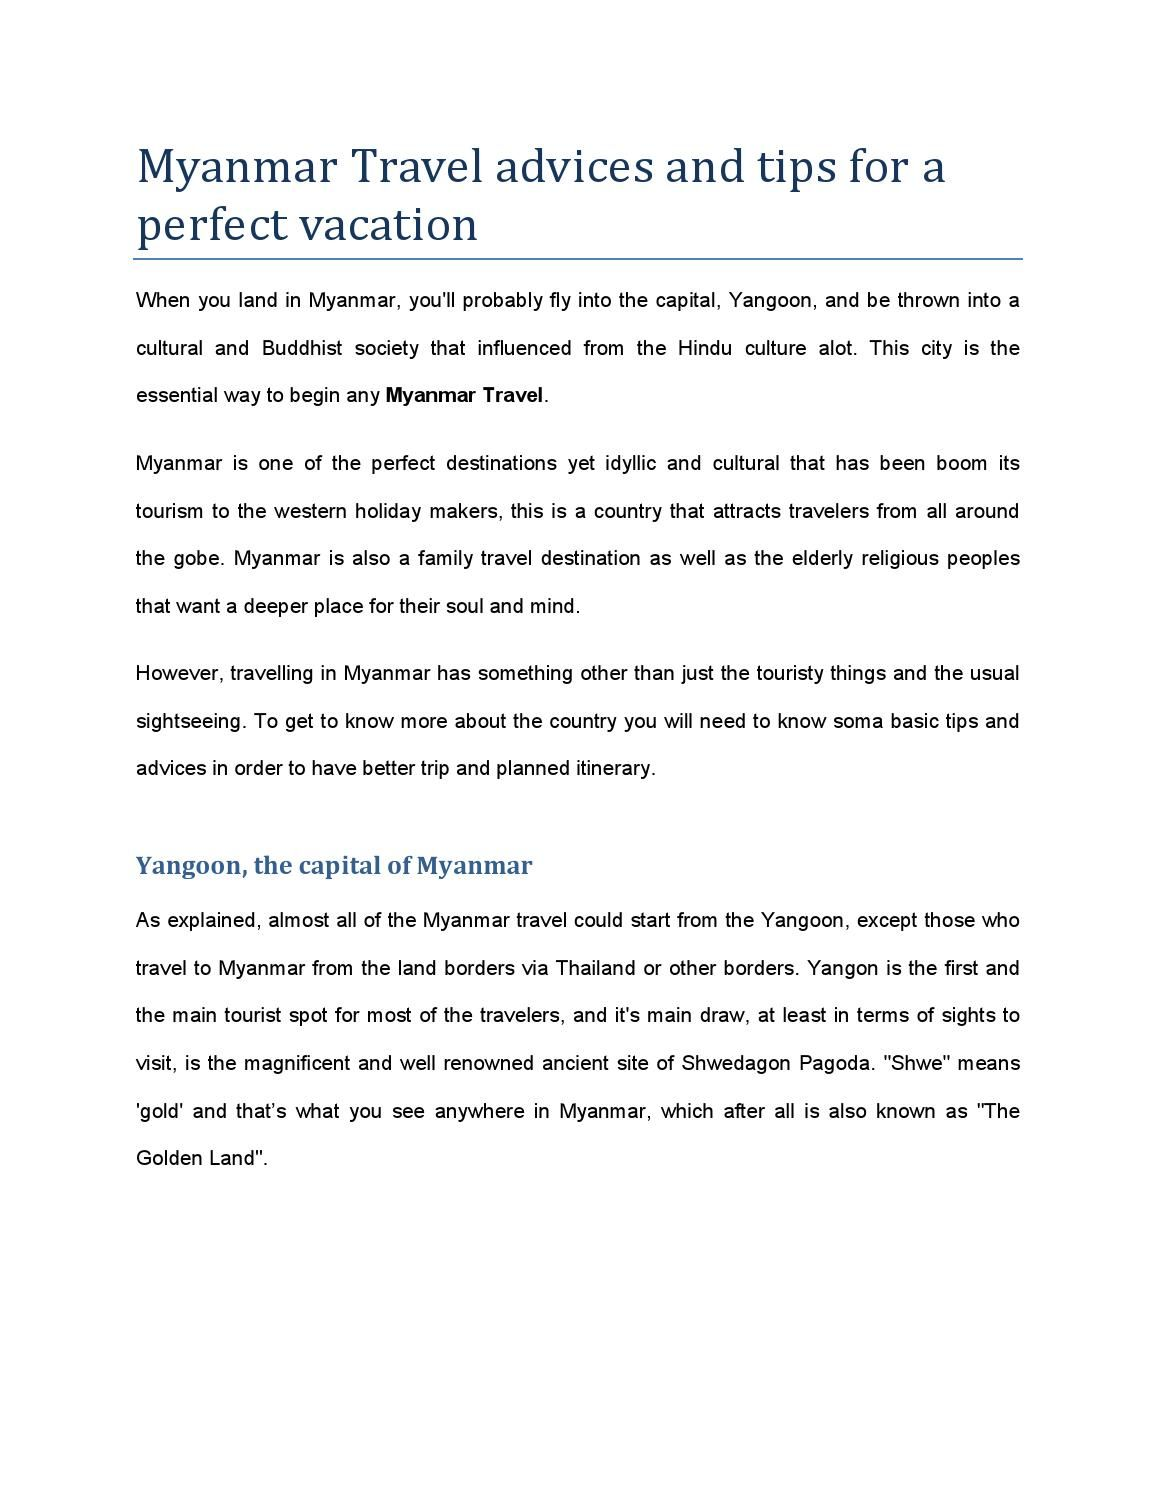 Myanmar Travel And Tip By Luxurytravelvietnam Com Advice Tourism Essays Advantage Disadvantage Of Mas Essay Pdf